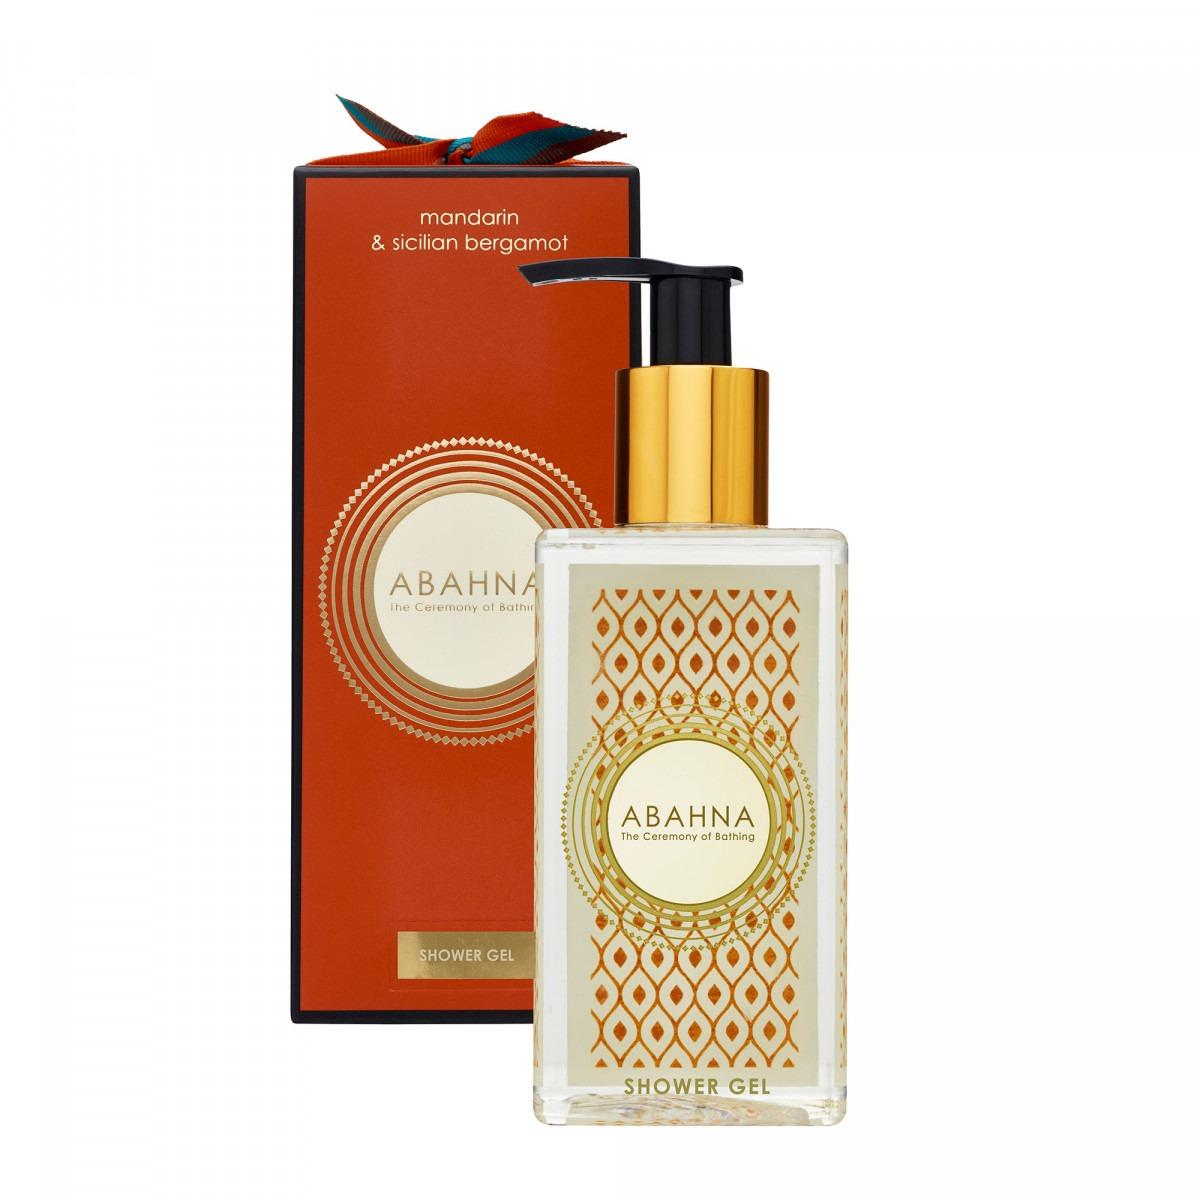 Abahna mandarin & sicilian bergamot shower gel 250ml